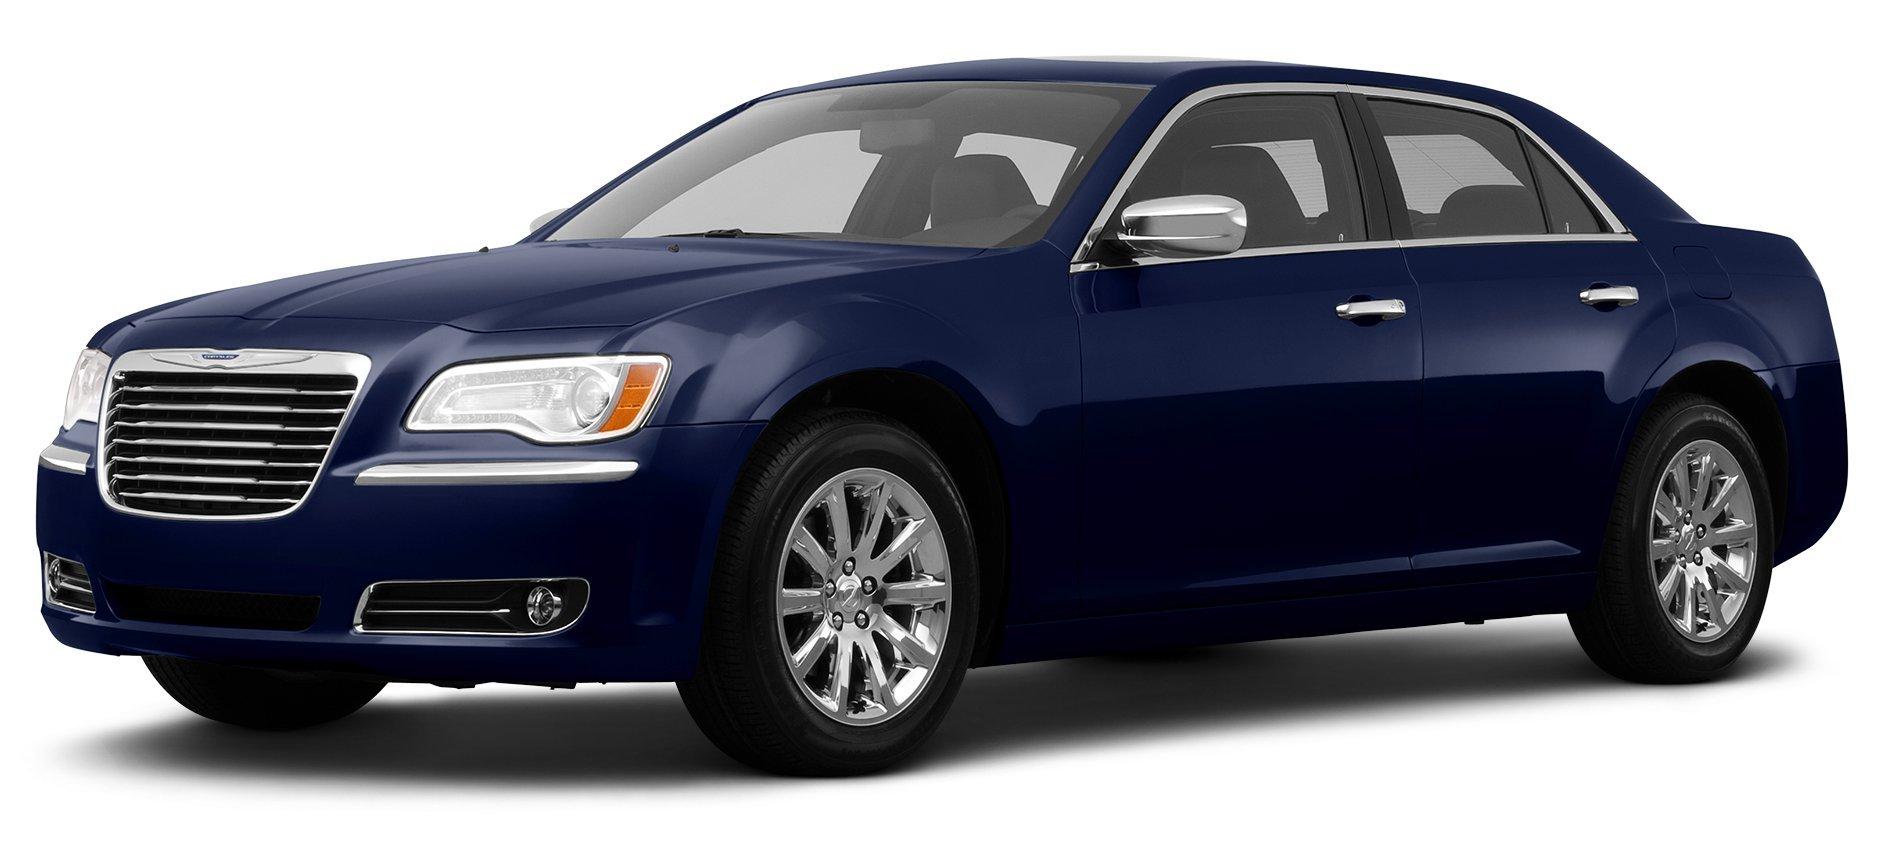 2012 Chrysler 300, 4-Door Sedan V6 Rear Wheel Drive ...